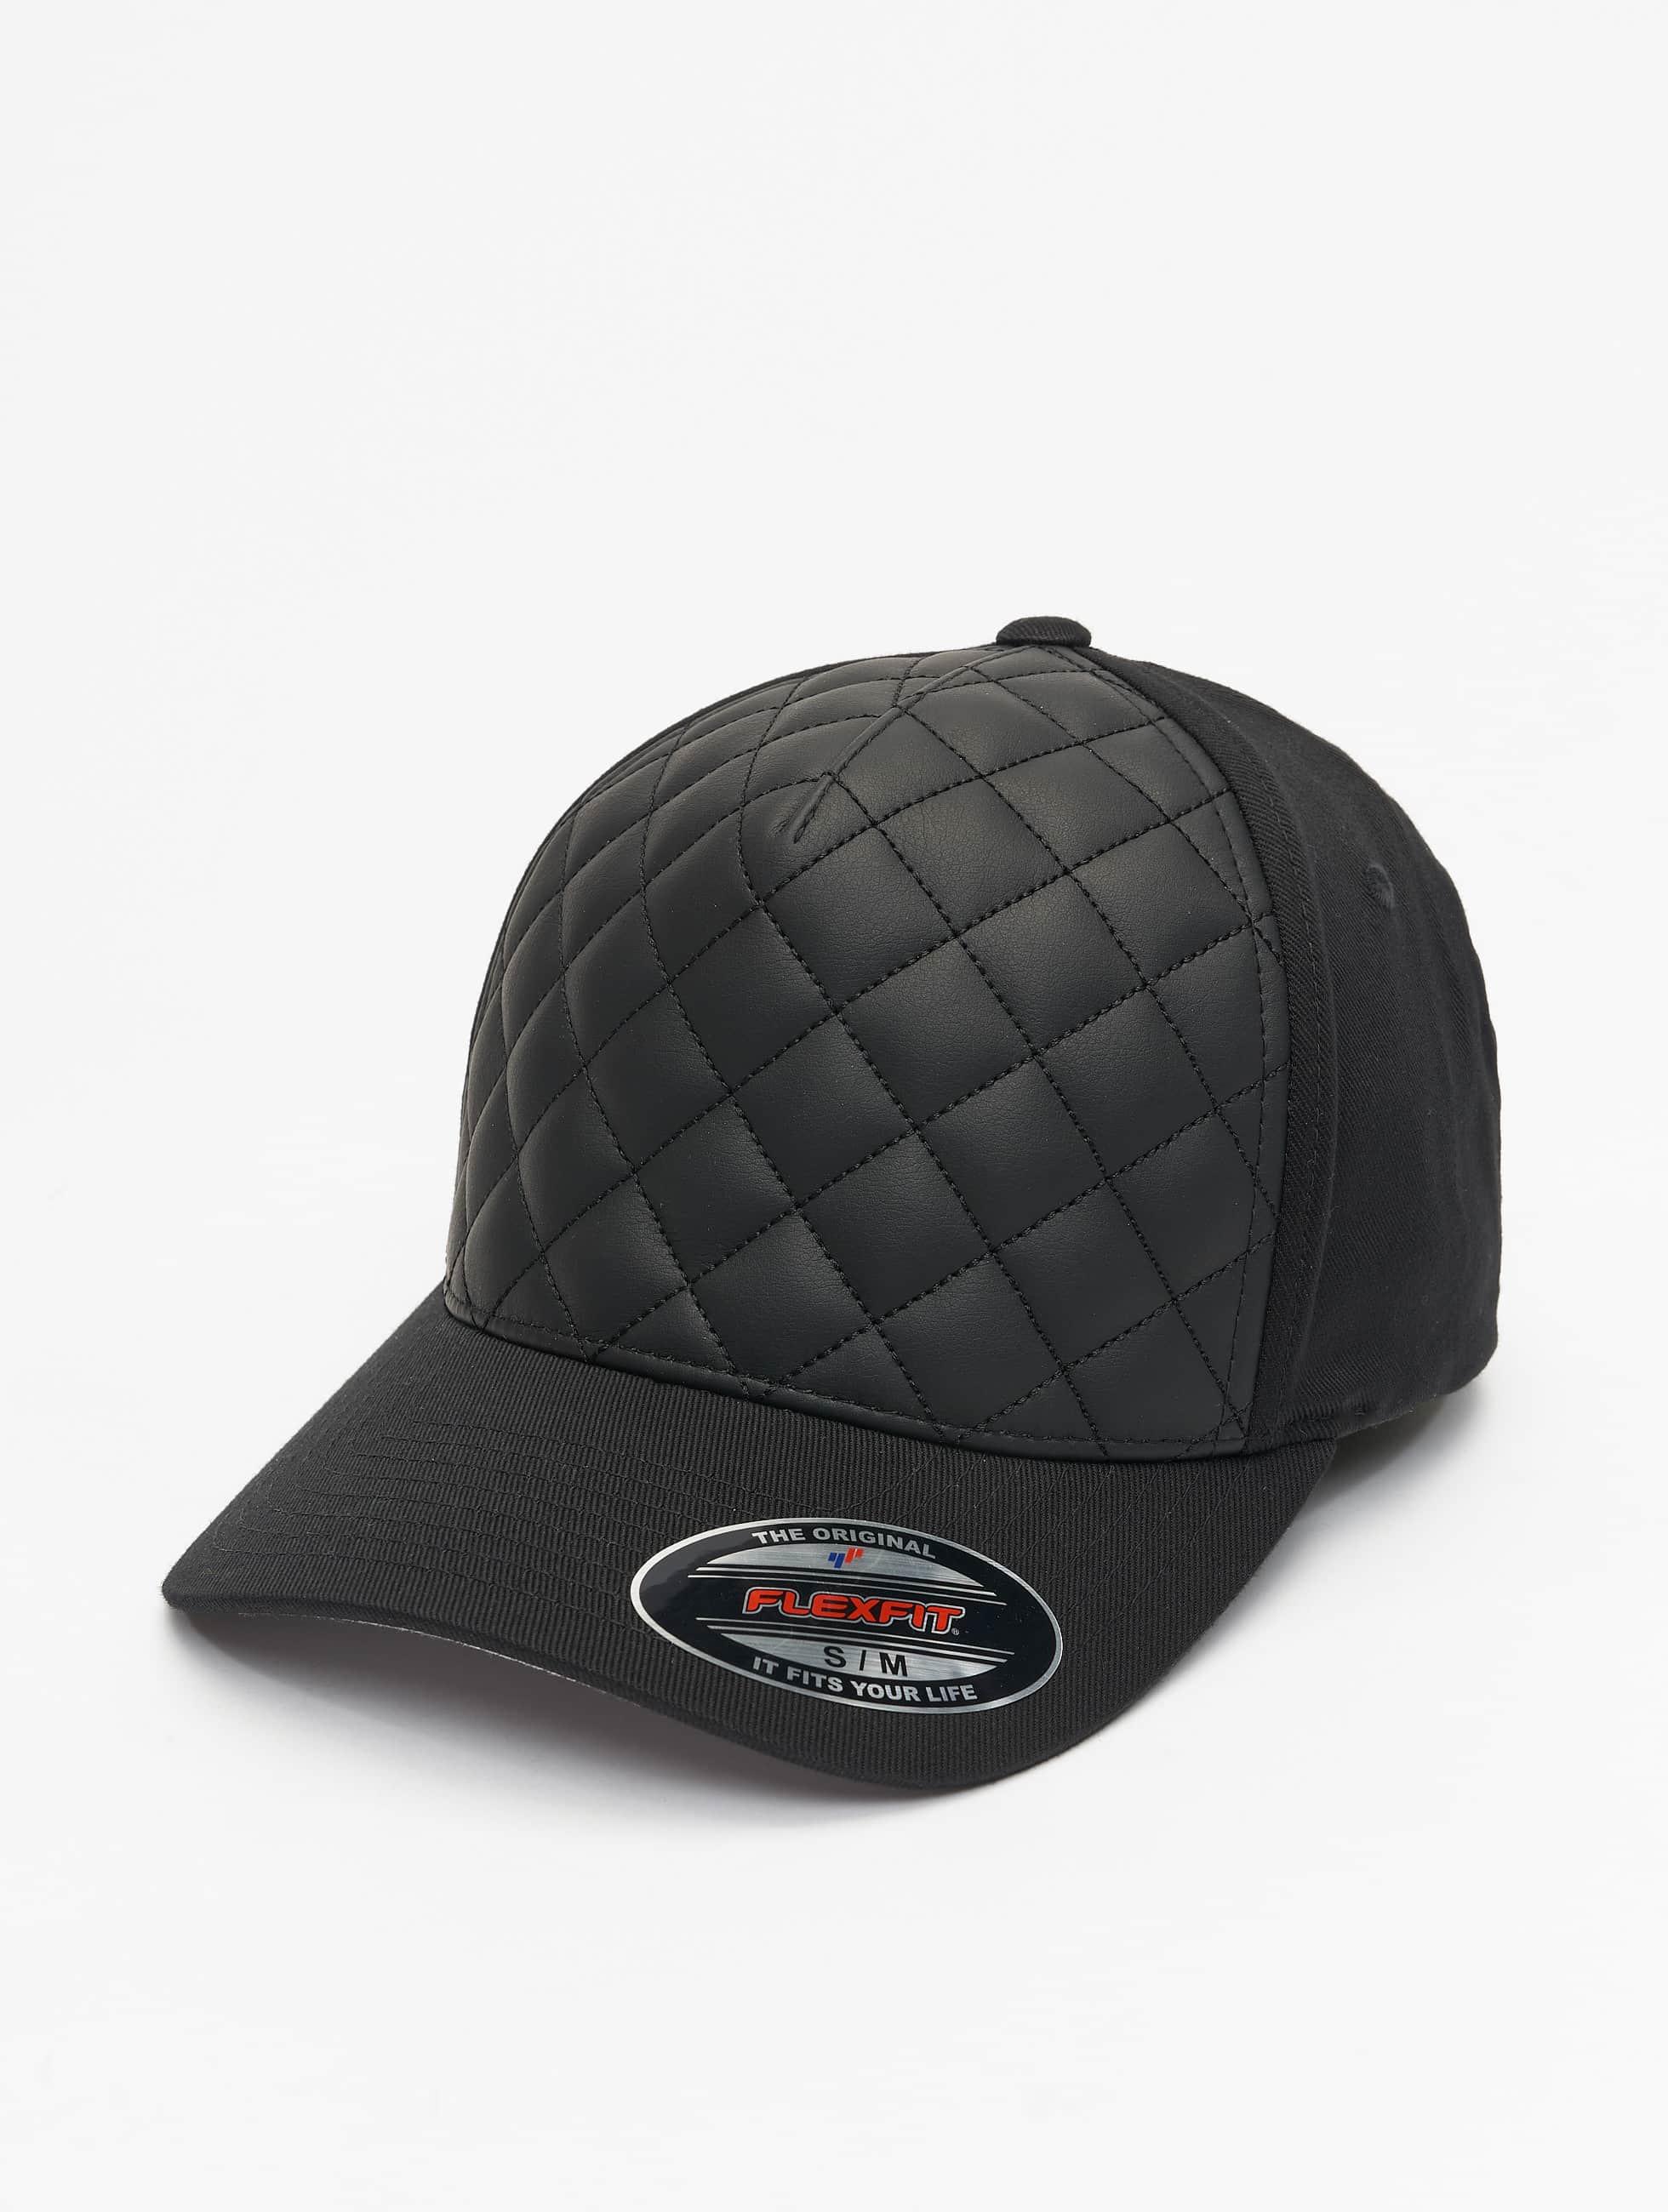 Flexfit Бейсболкa Flexfit Diamond Quilted черный